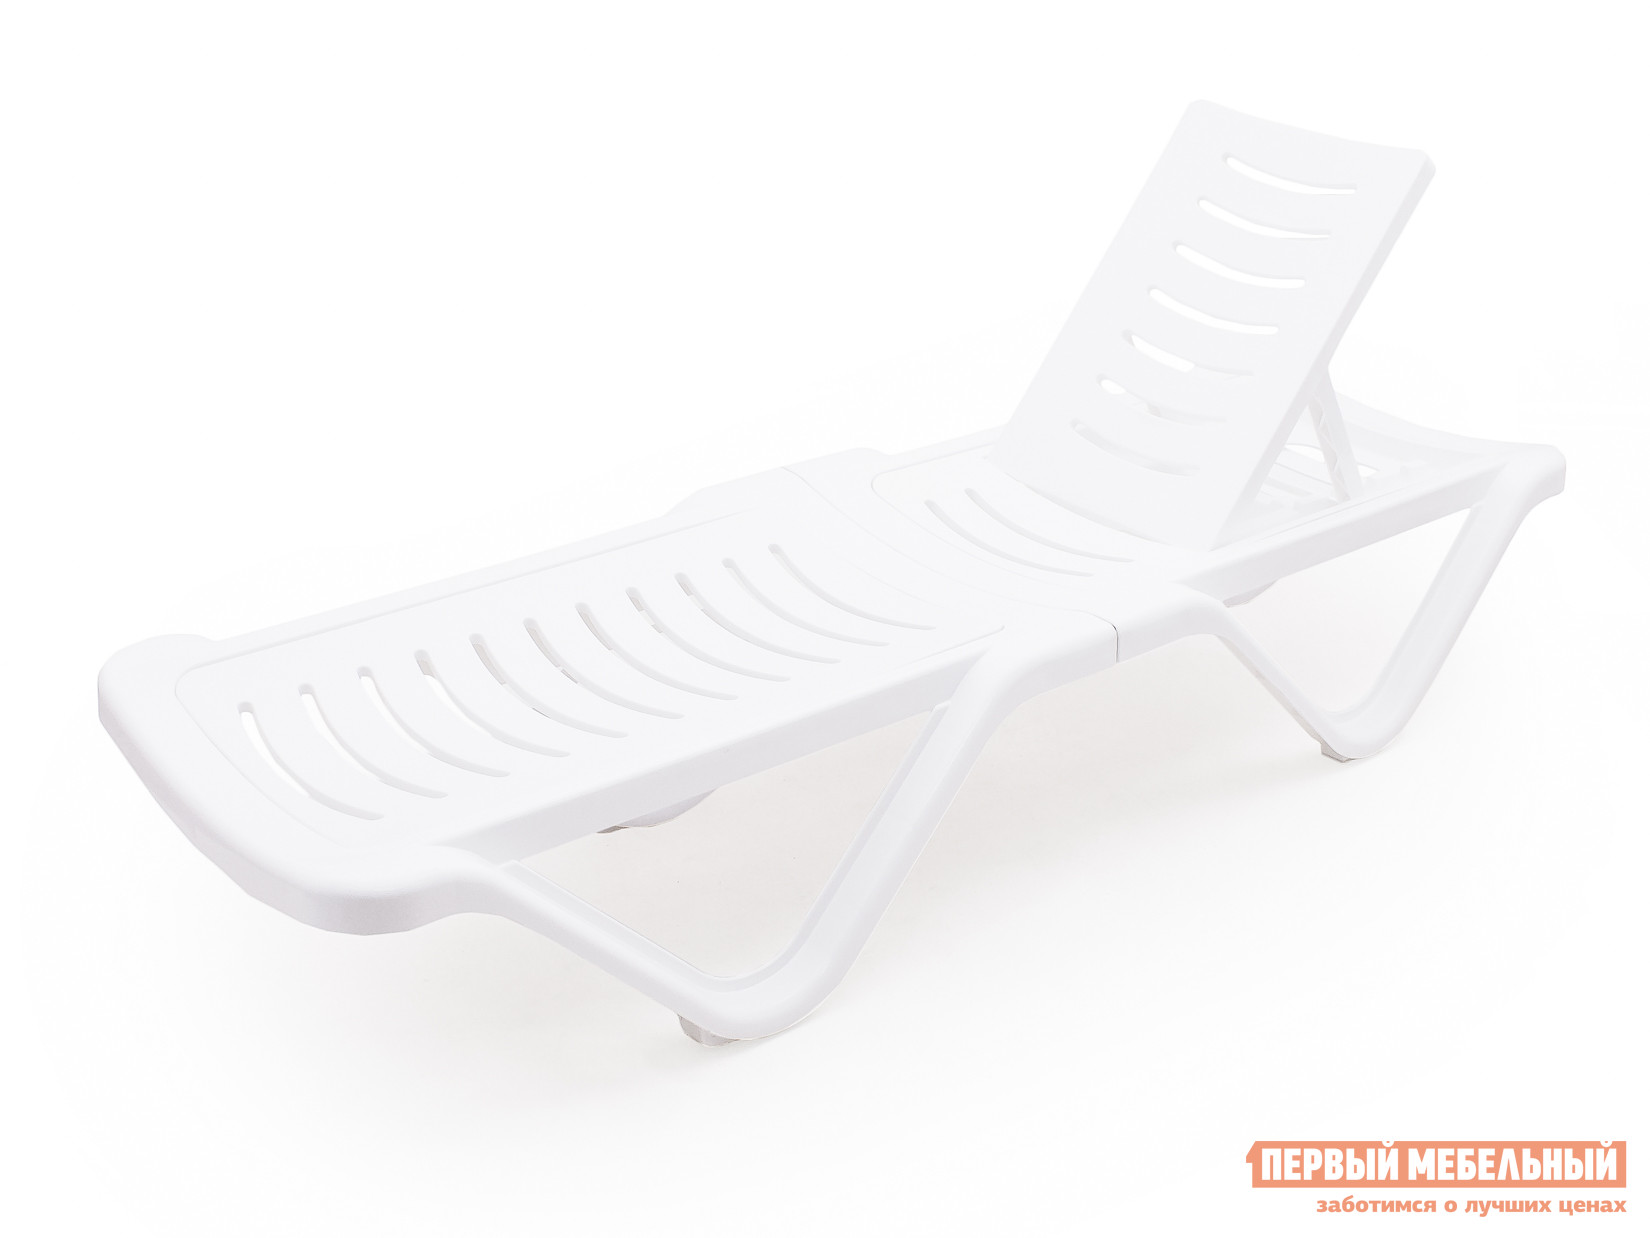 Лежак для дачи пластиковый Альтернатива Шезлонг (1920х620х320) белый пластиковый шезлонг алеана бриз